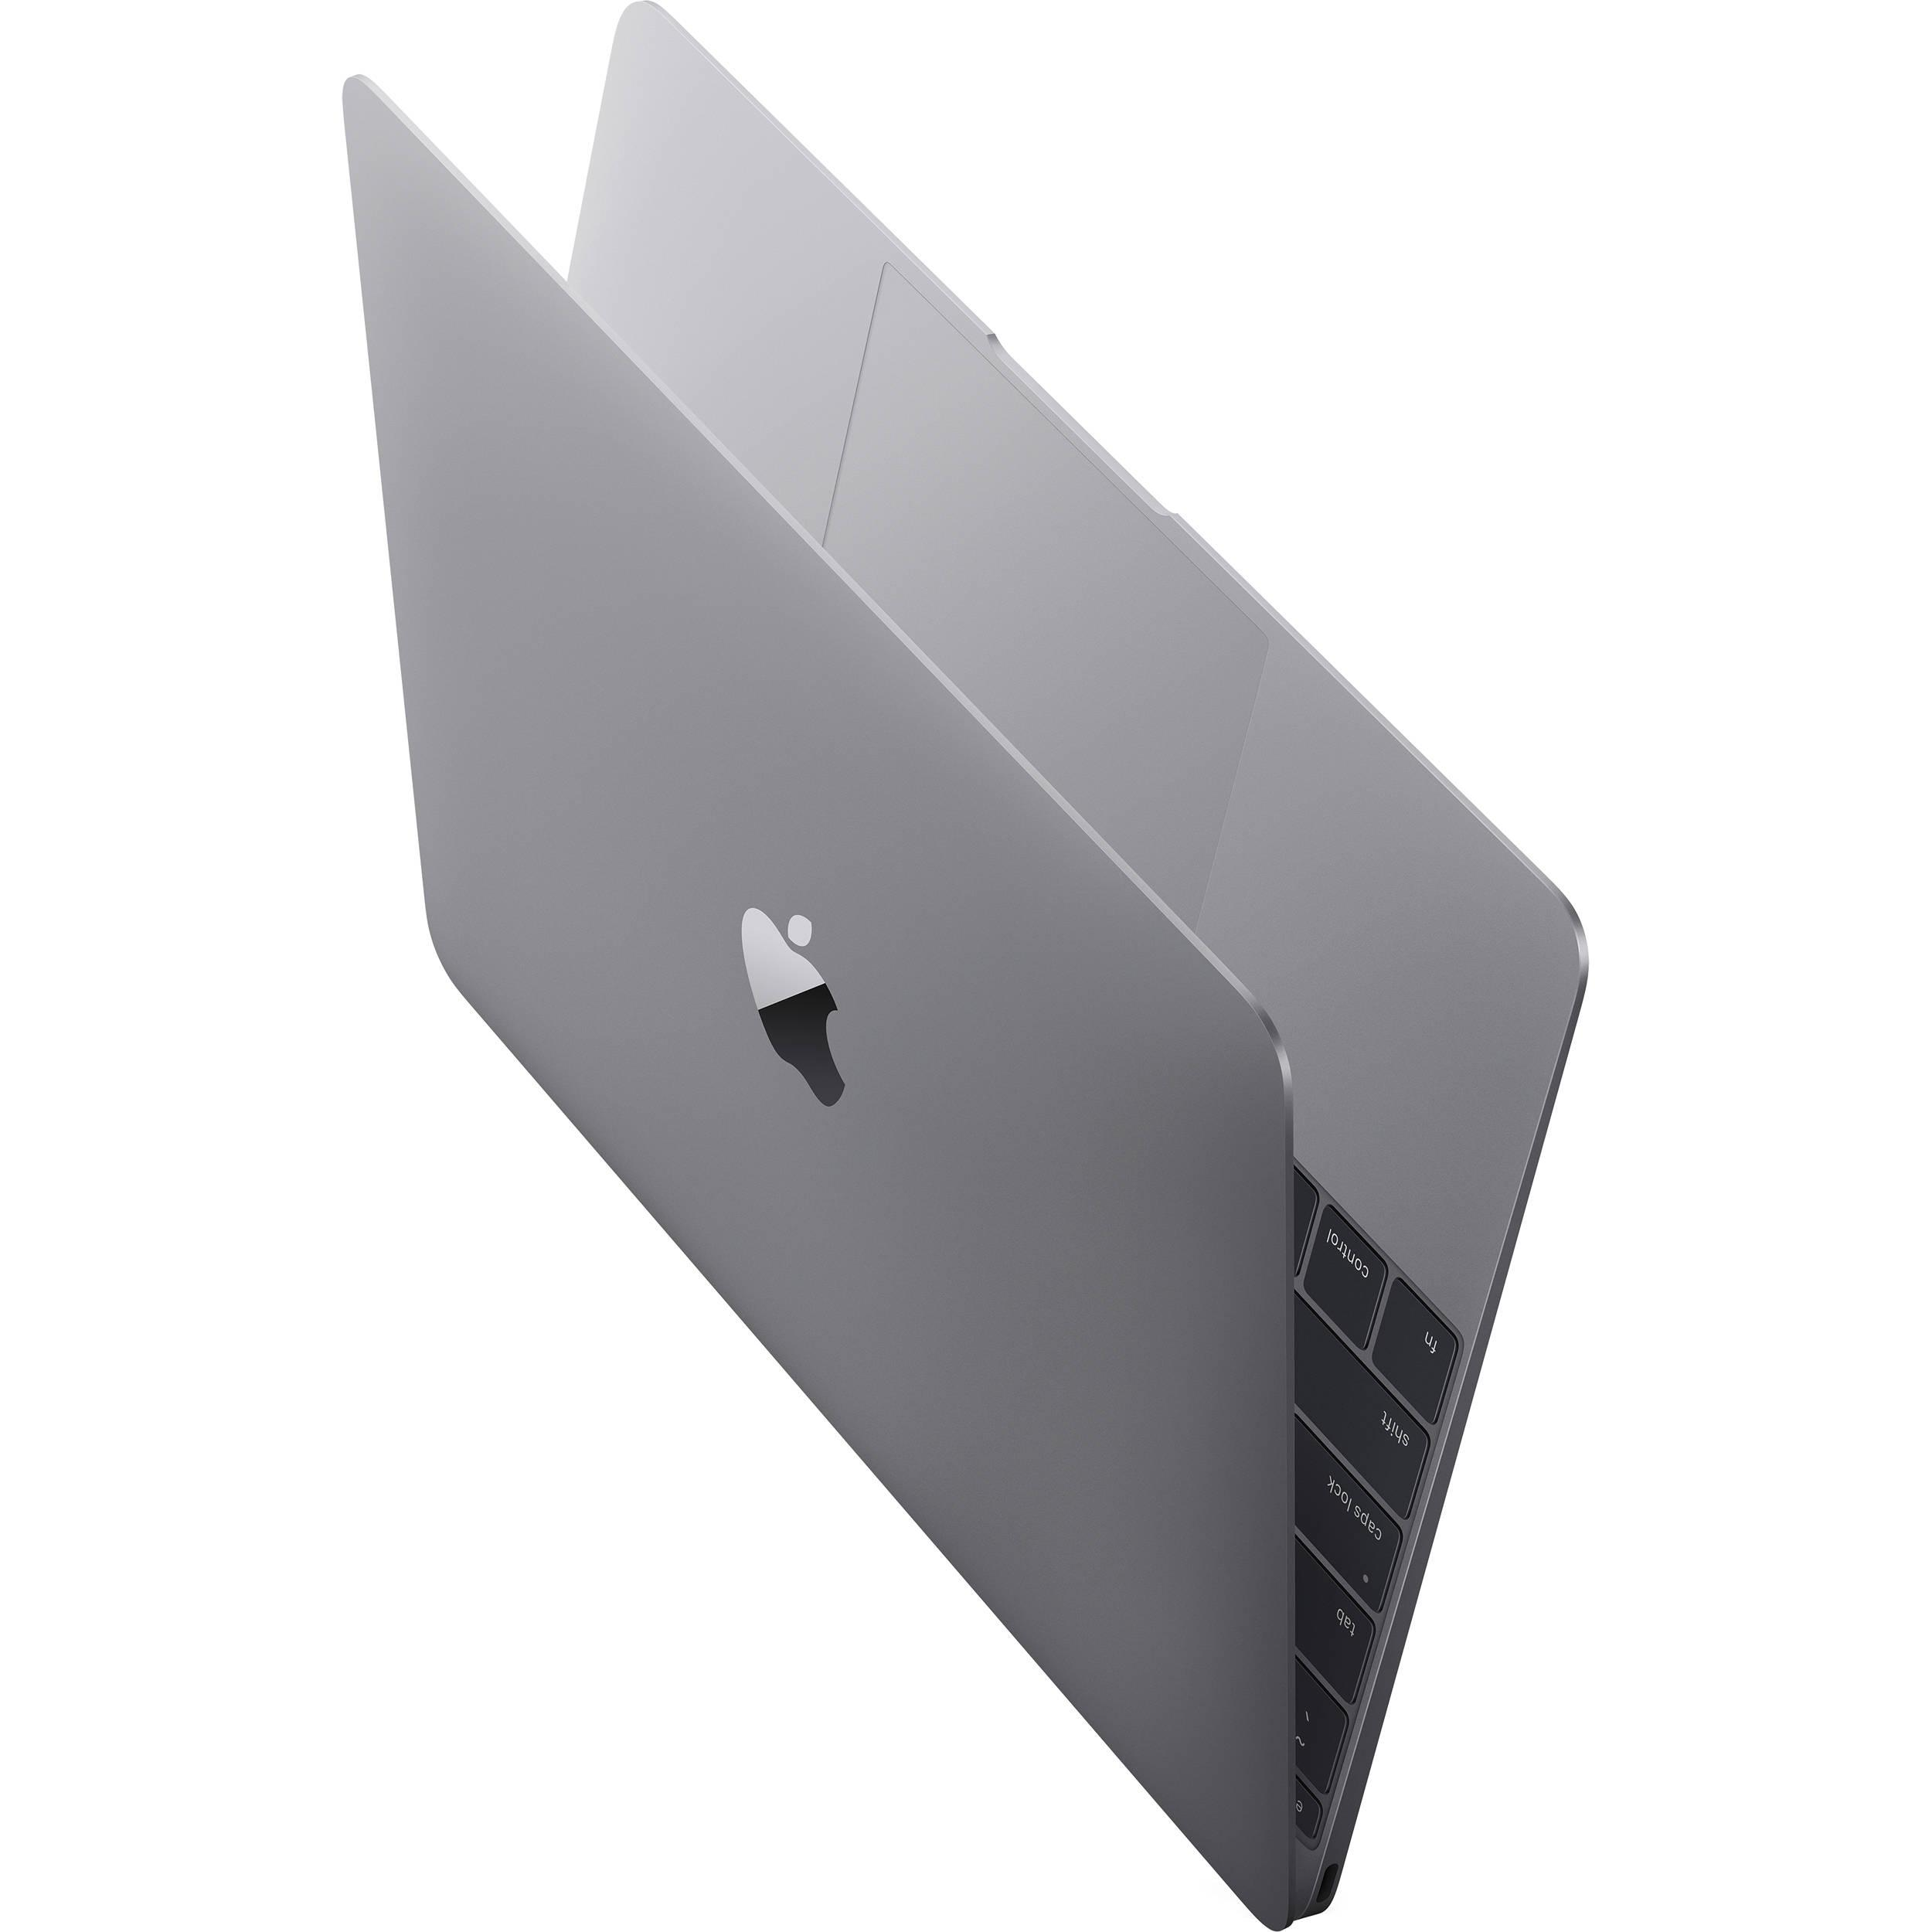 "MacBook 12"" Retina (2015) - Core m 1,2 GHz - HDD 512 GB - 8GB - AZERTY - Frans"